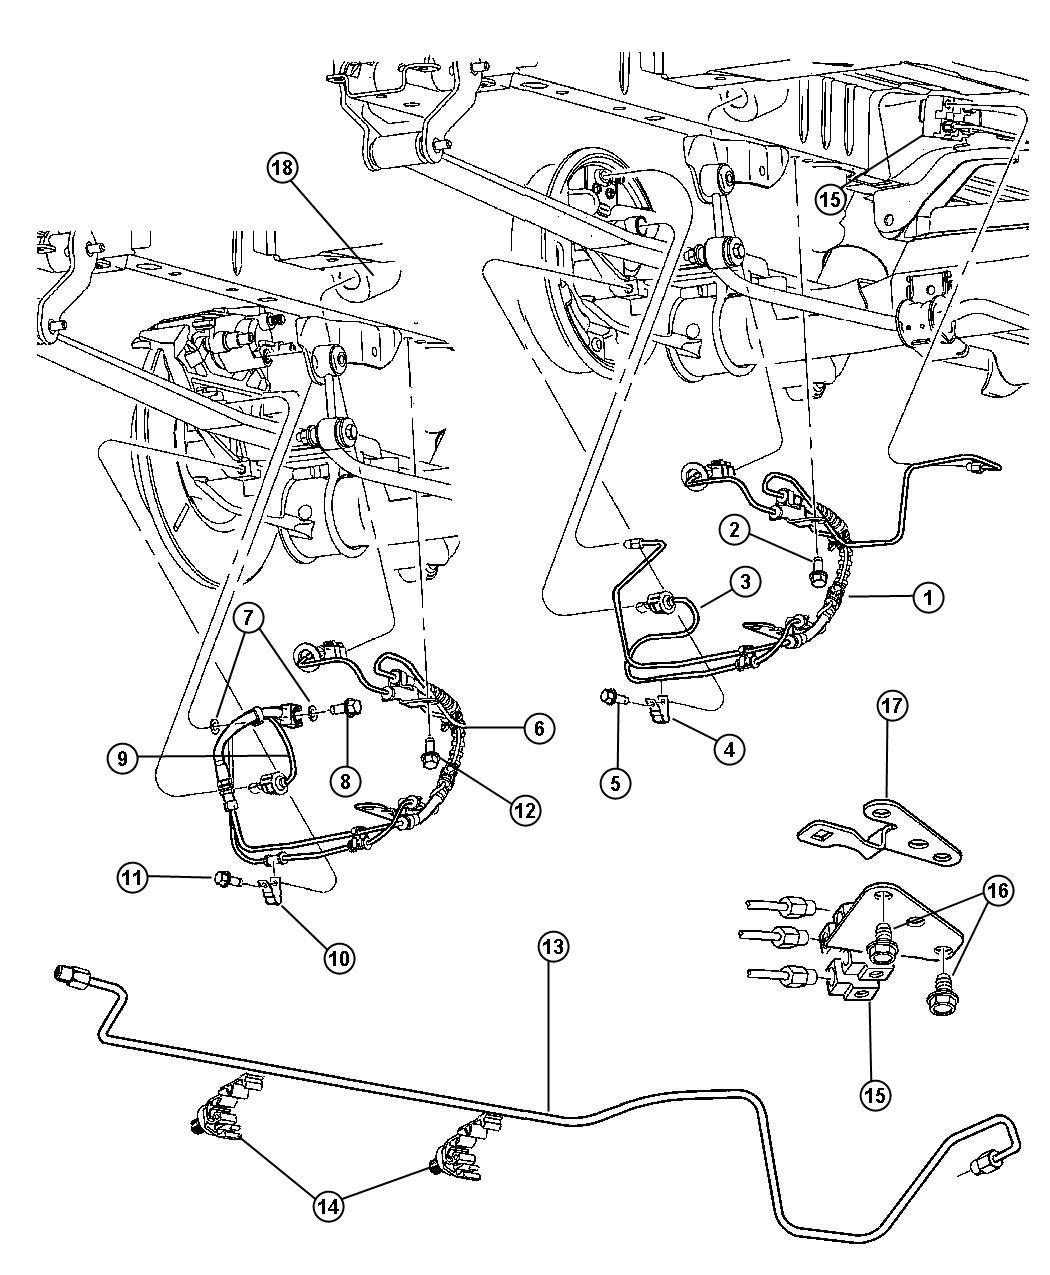 Dodge Caravan Lines and Hoses, Rear Brakes